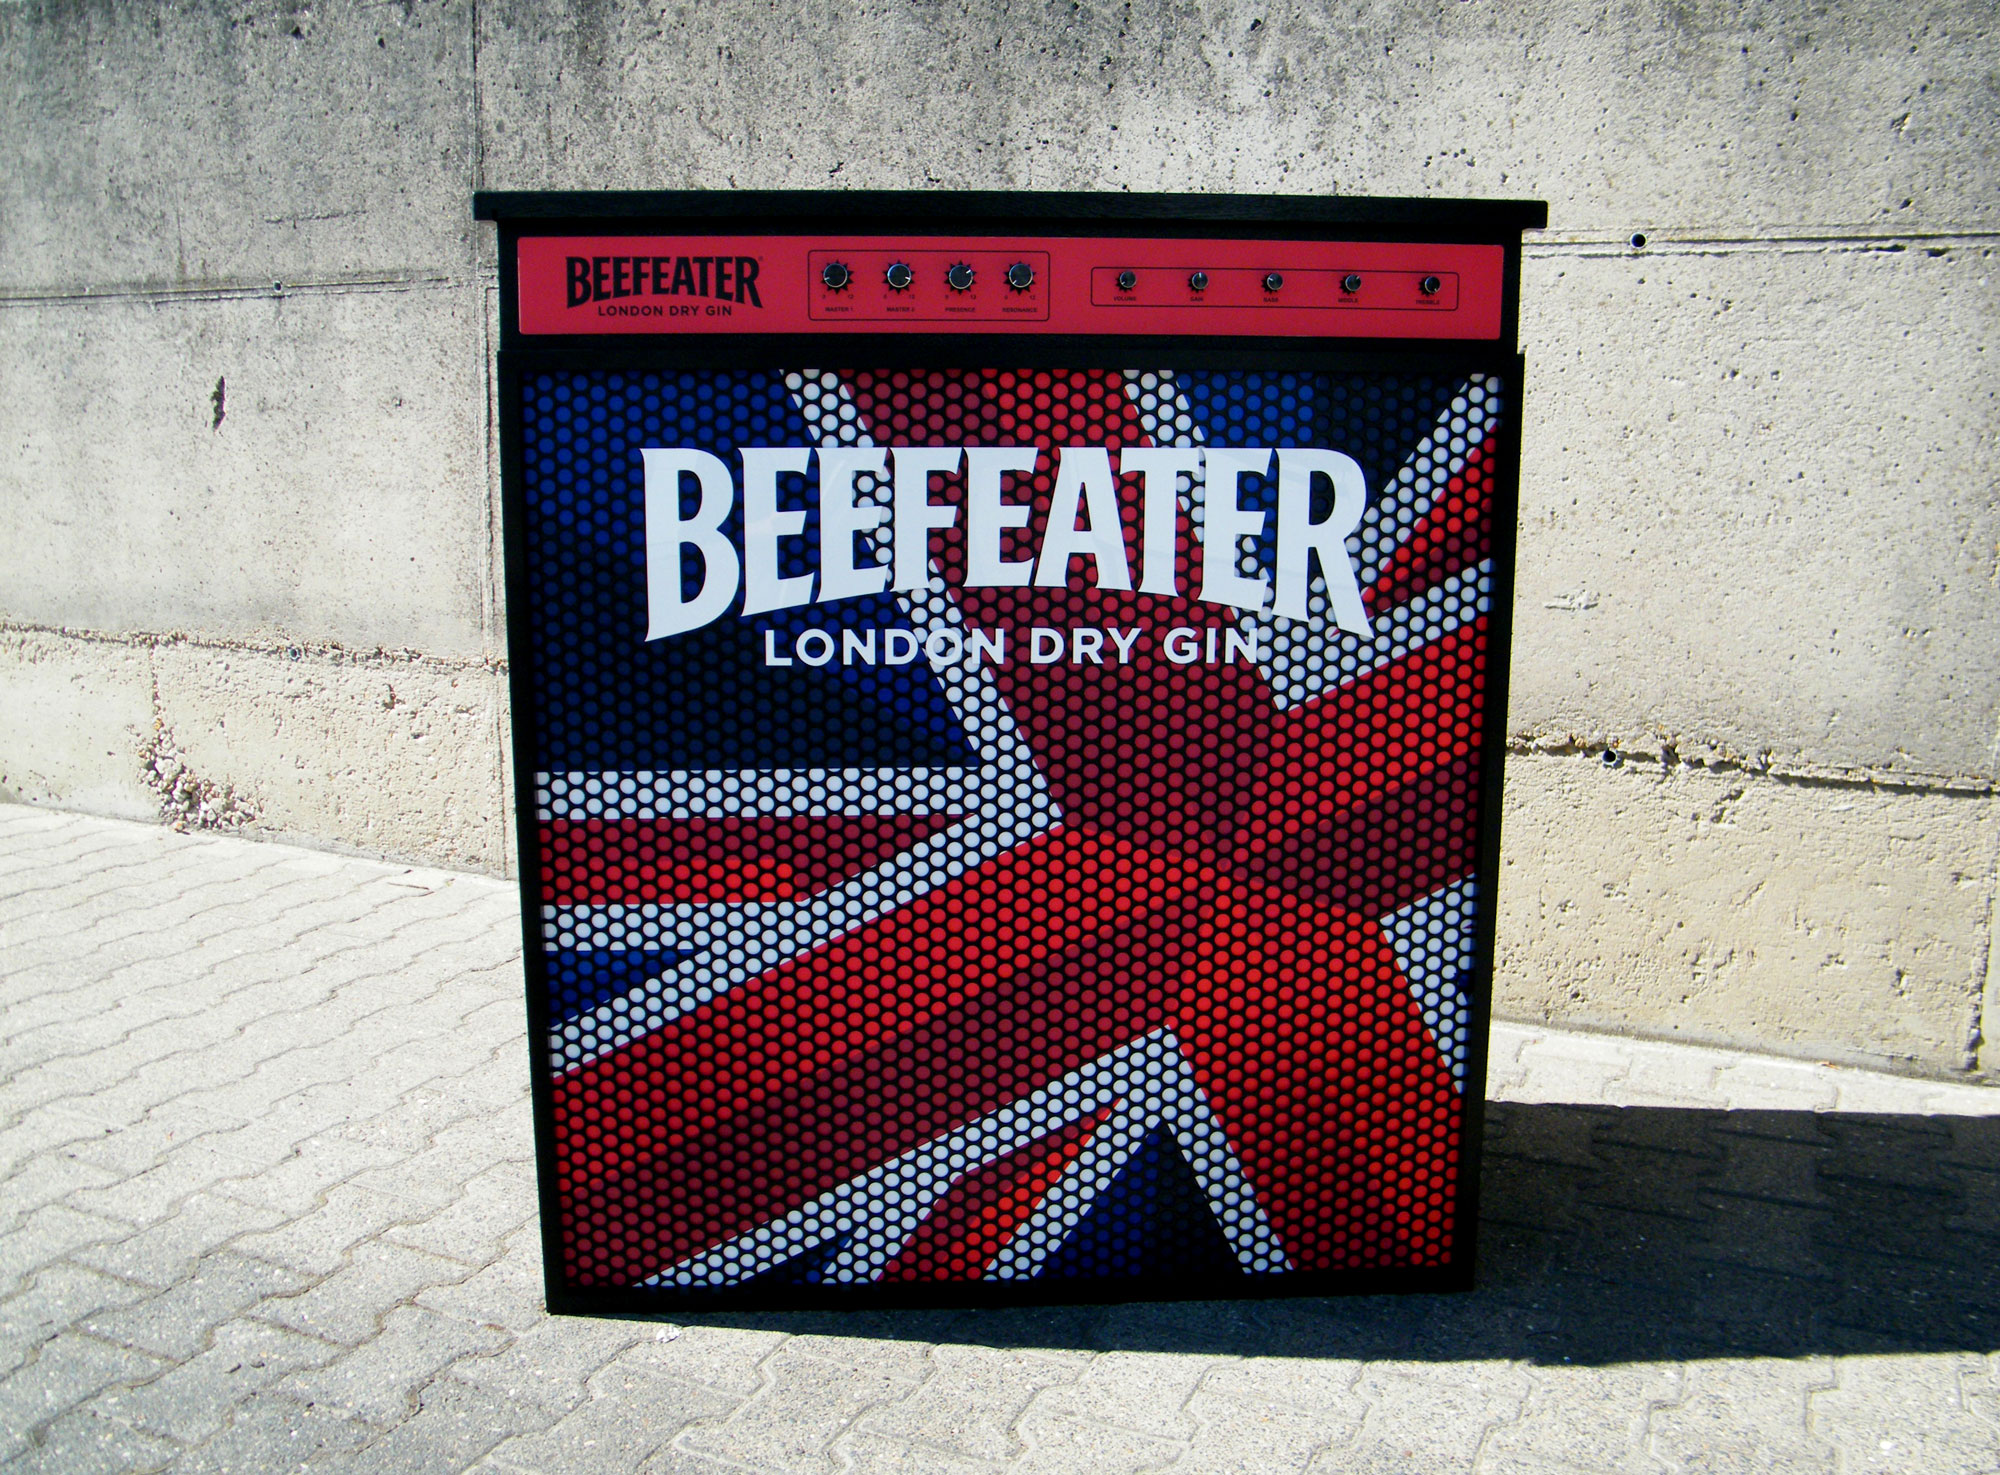 Beefeater Gin Mobile Bar stil manipulation 2016